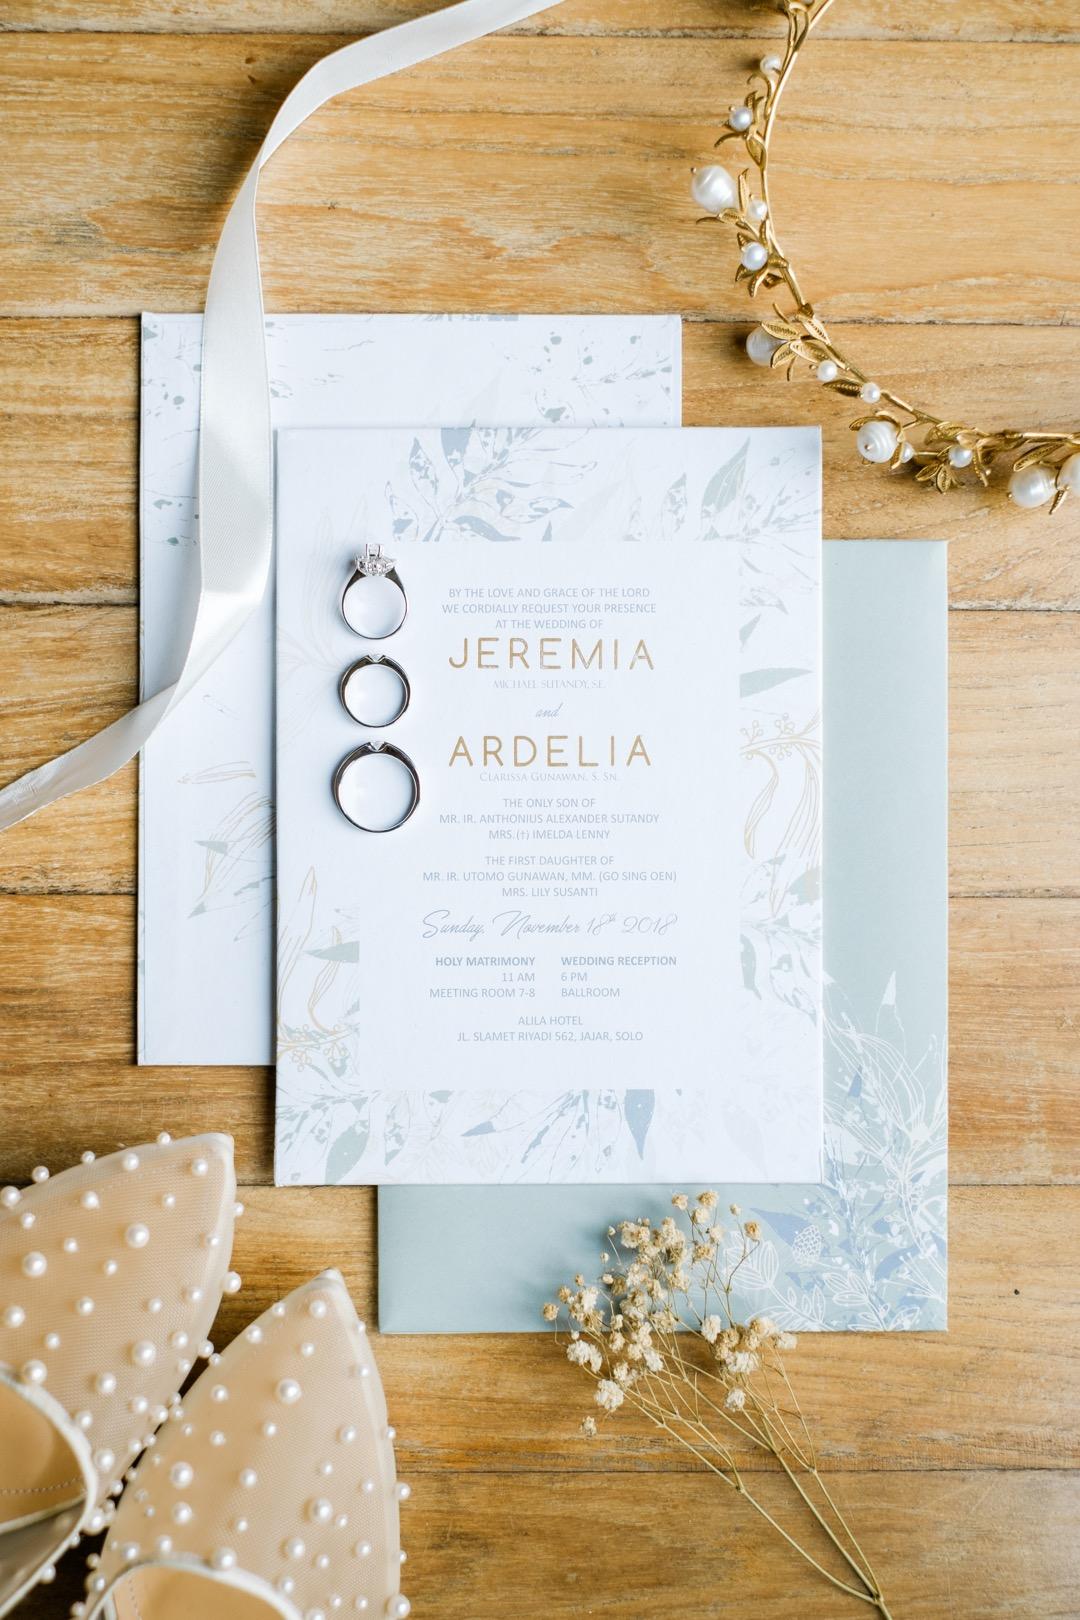 2 : Ardelia & Jeremia